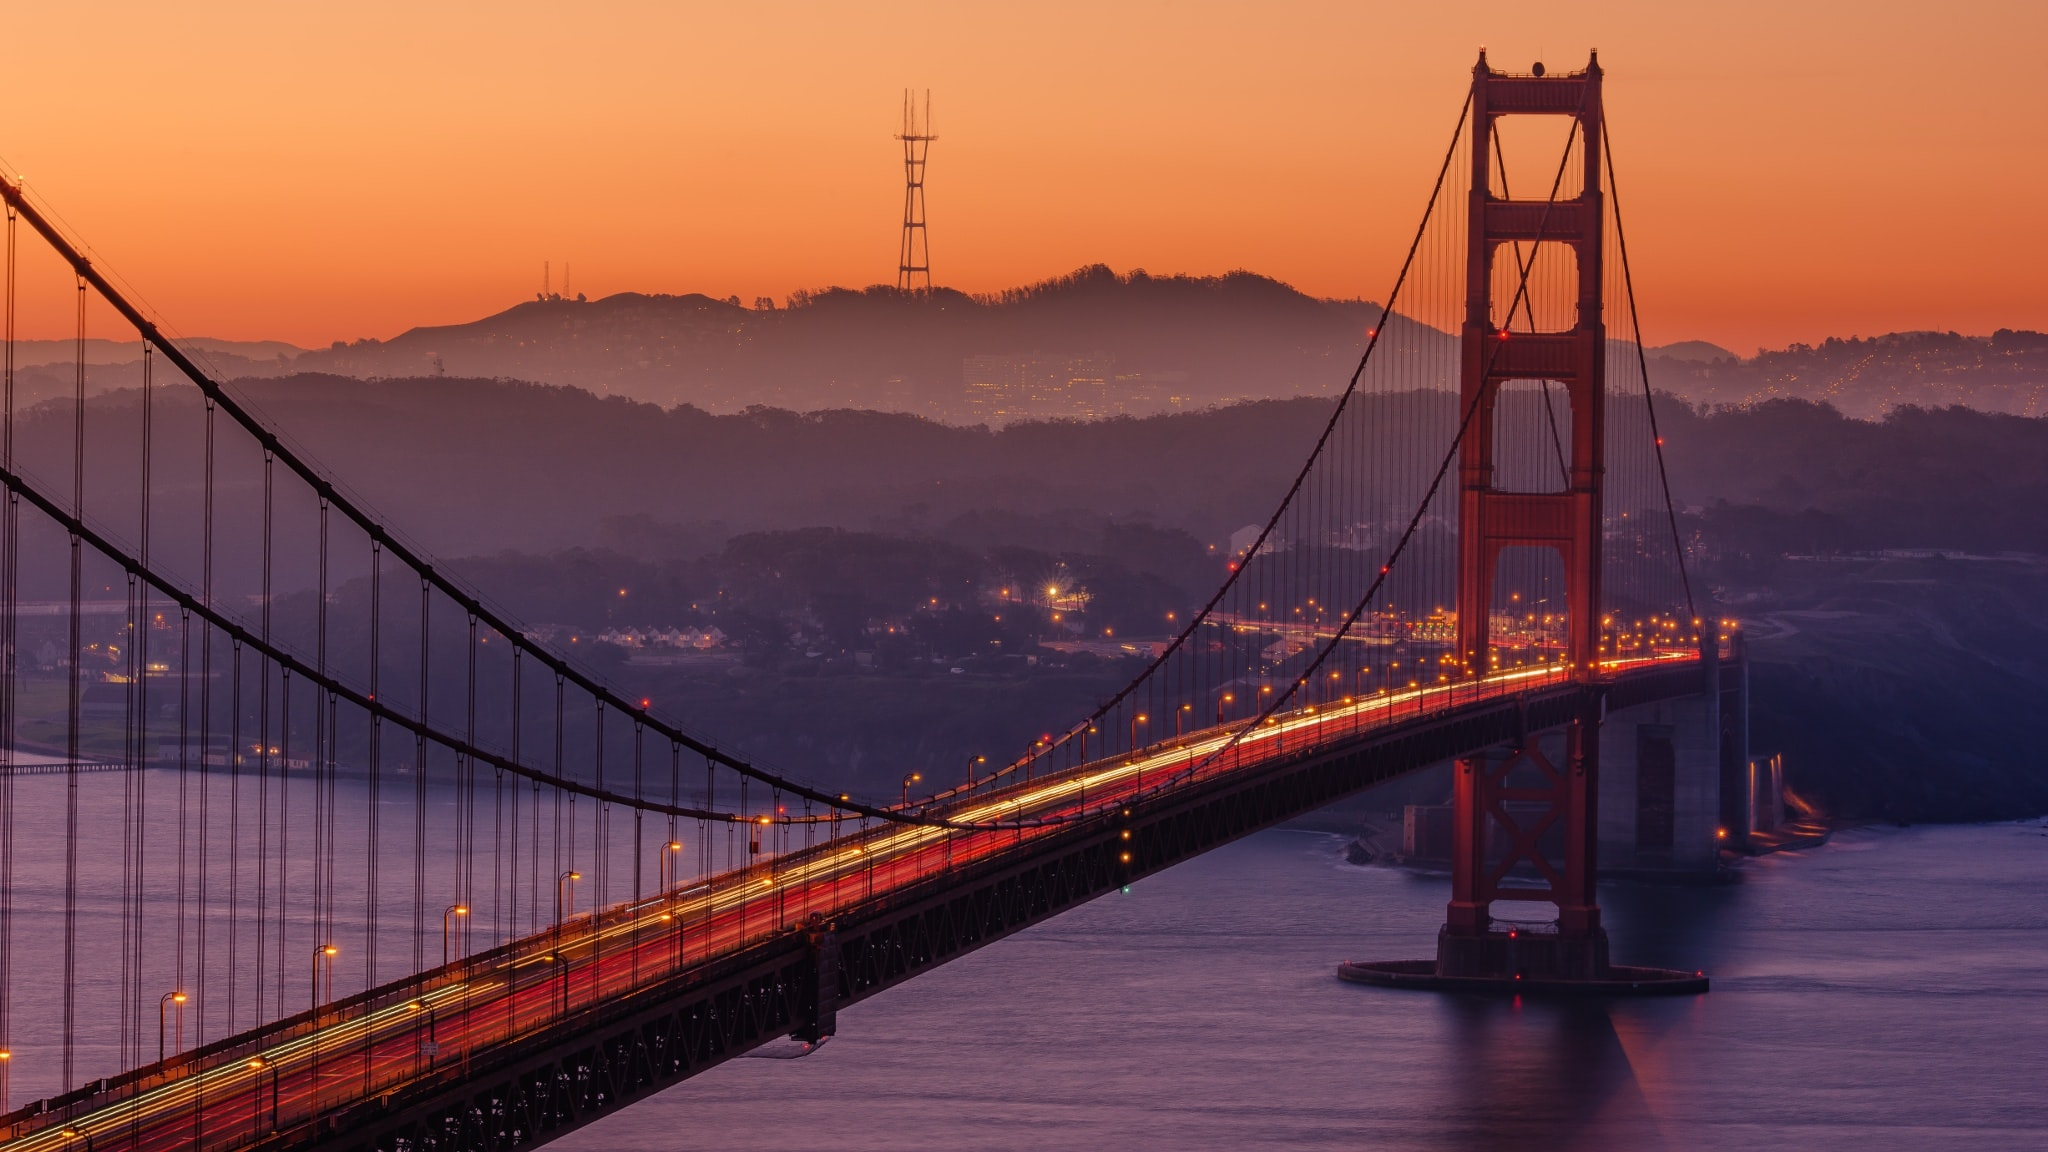 A sunset shot taken with Golden Gate Bridge as the focal point